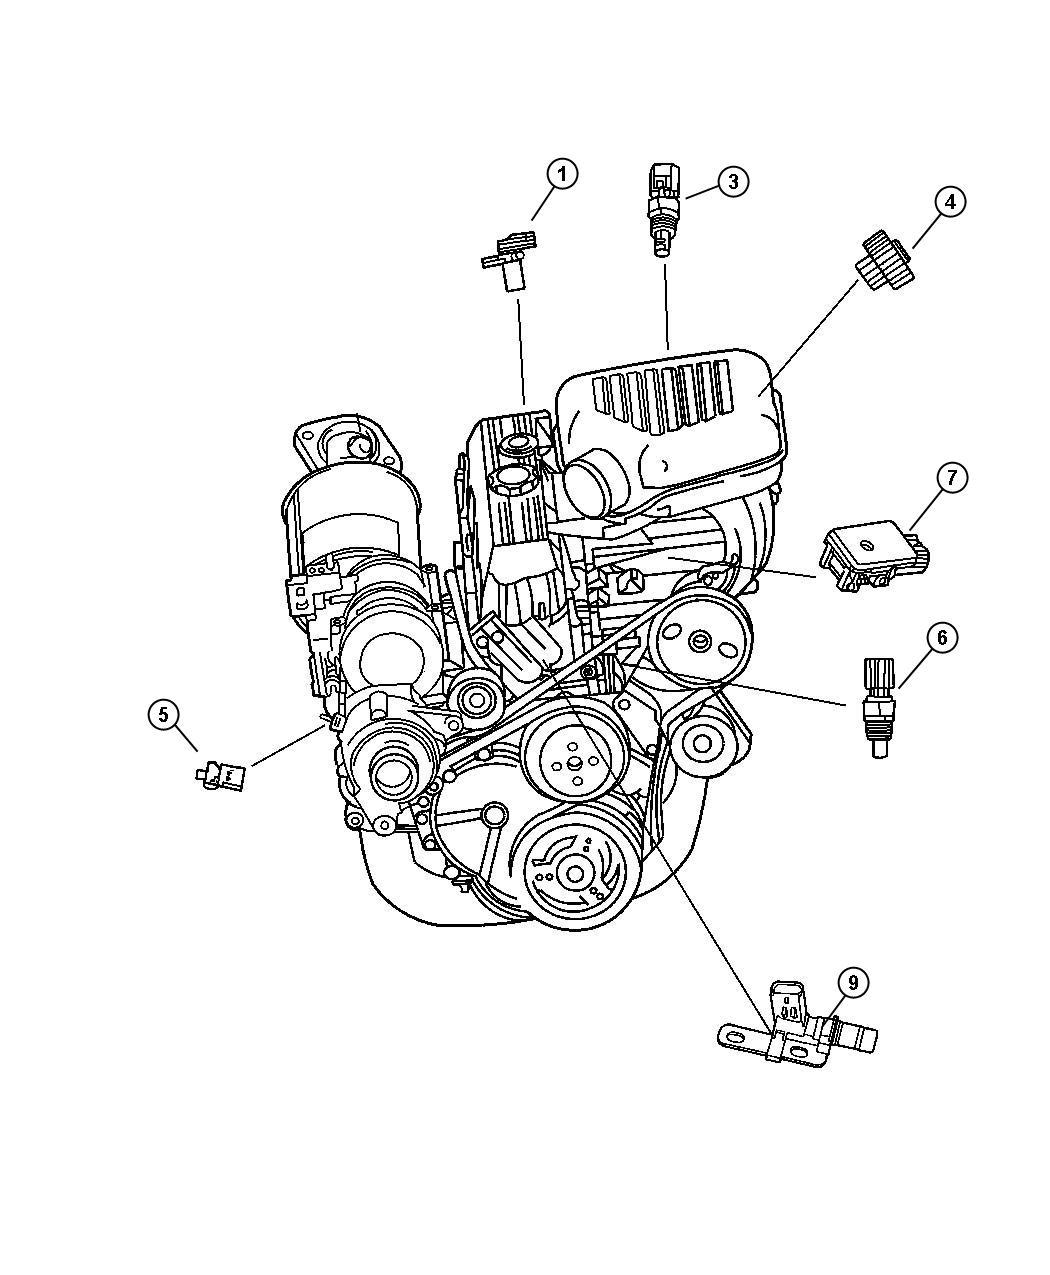 Jeep Wrangler Sensors 2 4l Engine Ed0